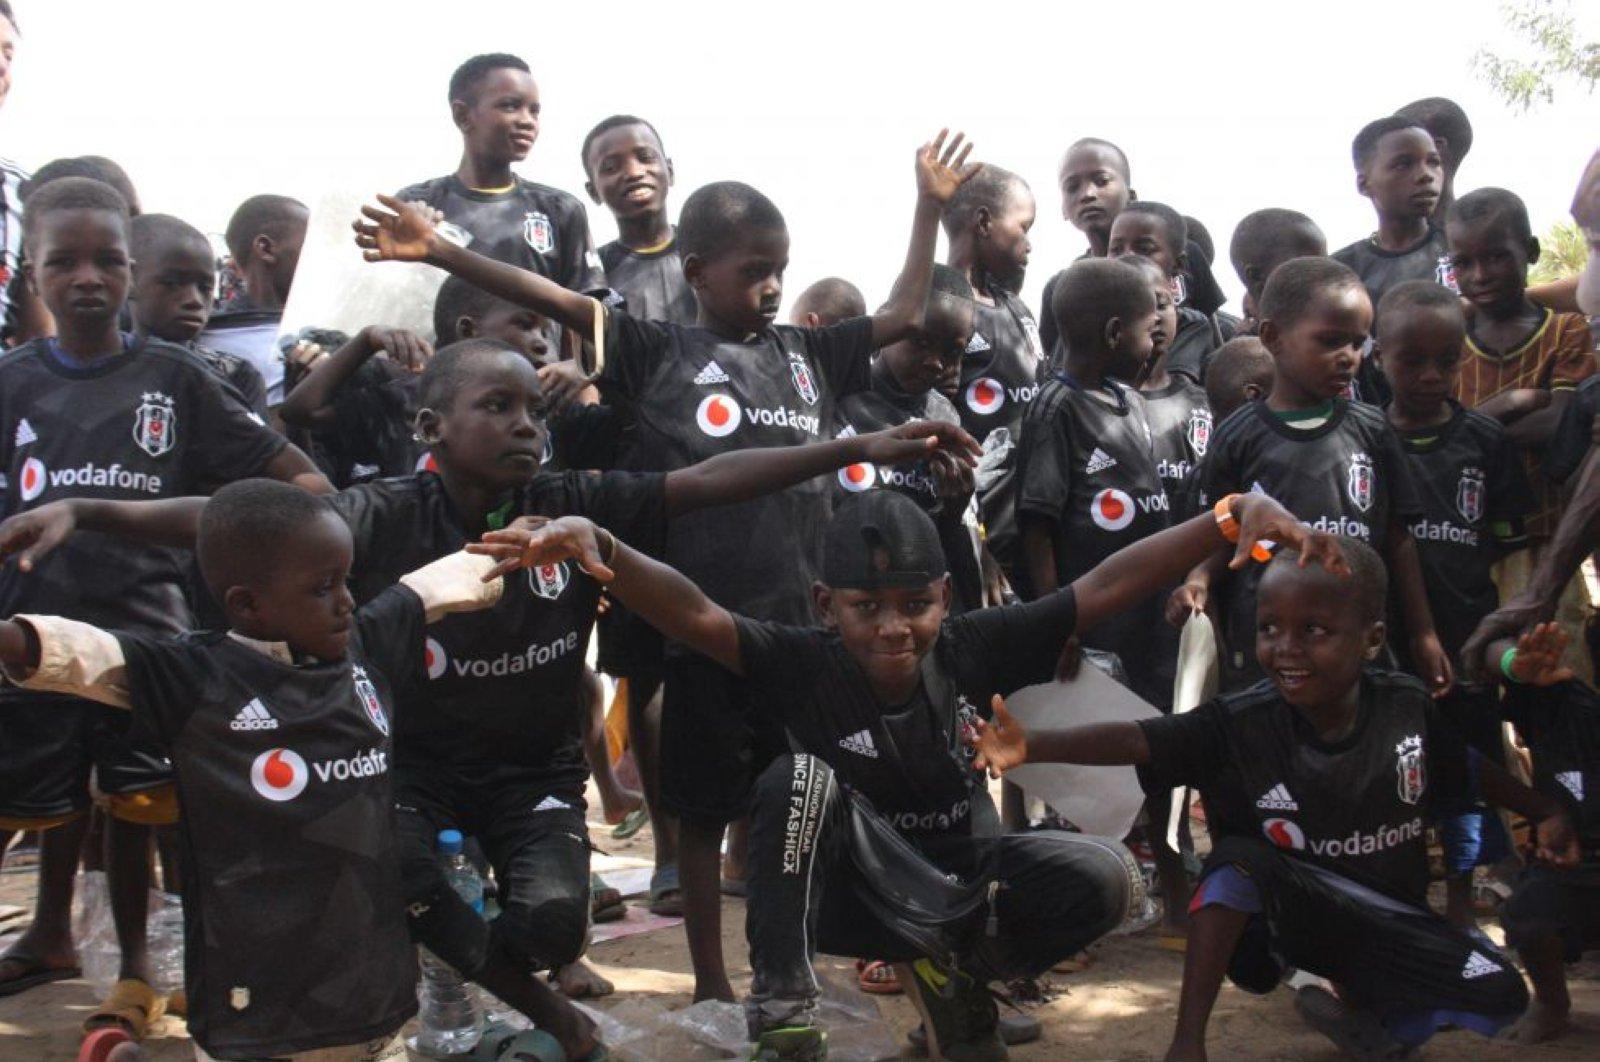 Children in Niger's Niamey in Beşiktaş jerseys, June 10, 2020 (AA Photo)